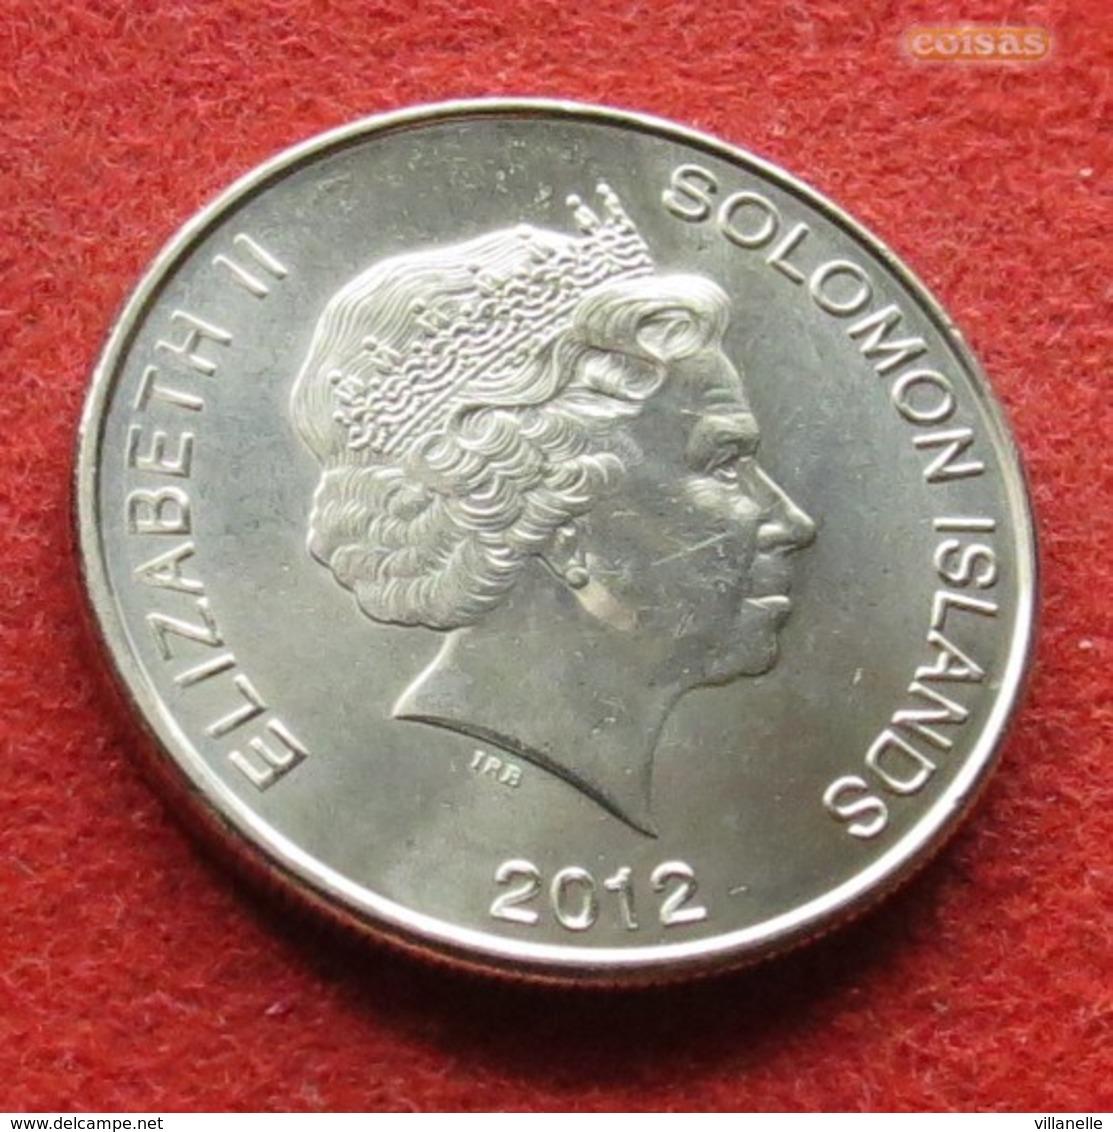 Solomon Islands 50 Cents 2012 Salomon Salomão - Salomonen